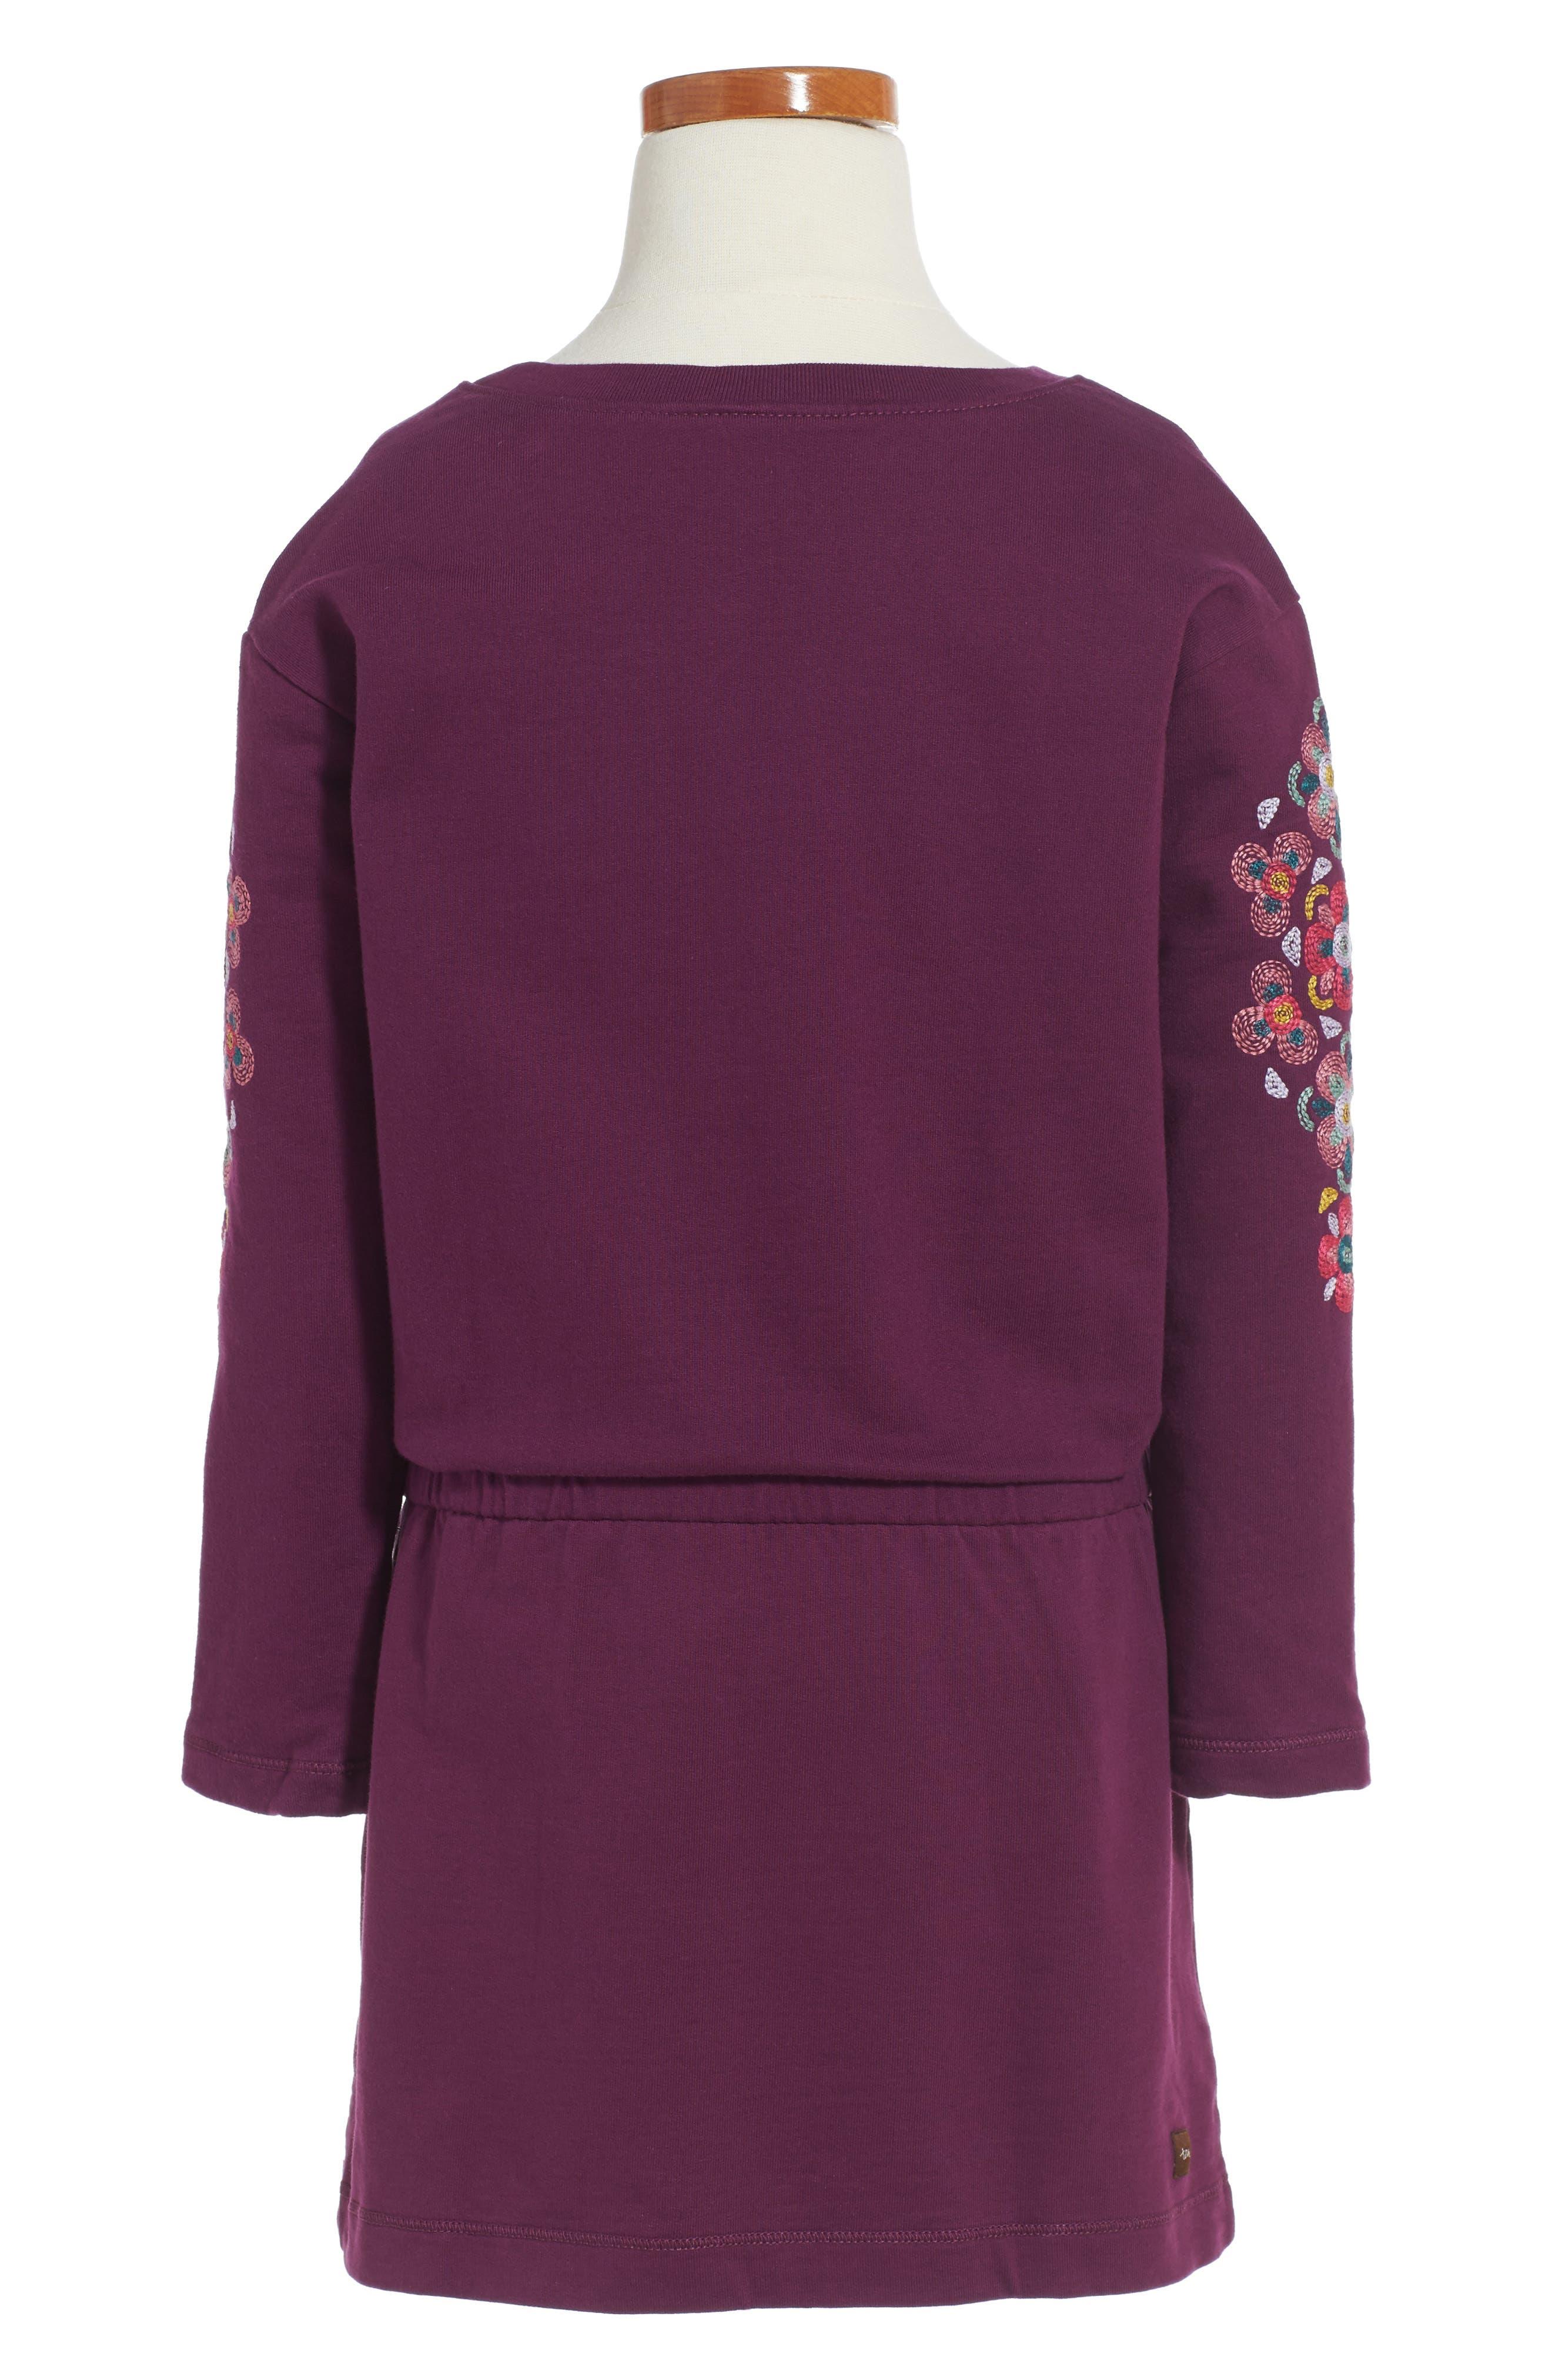 Willow Dress,                             Alternate thumbnail 2, color,                             527